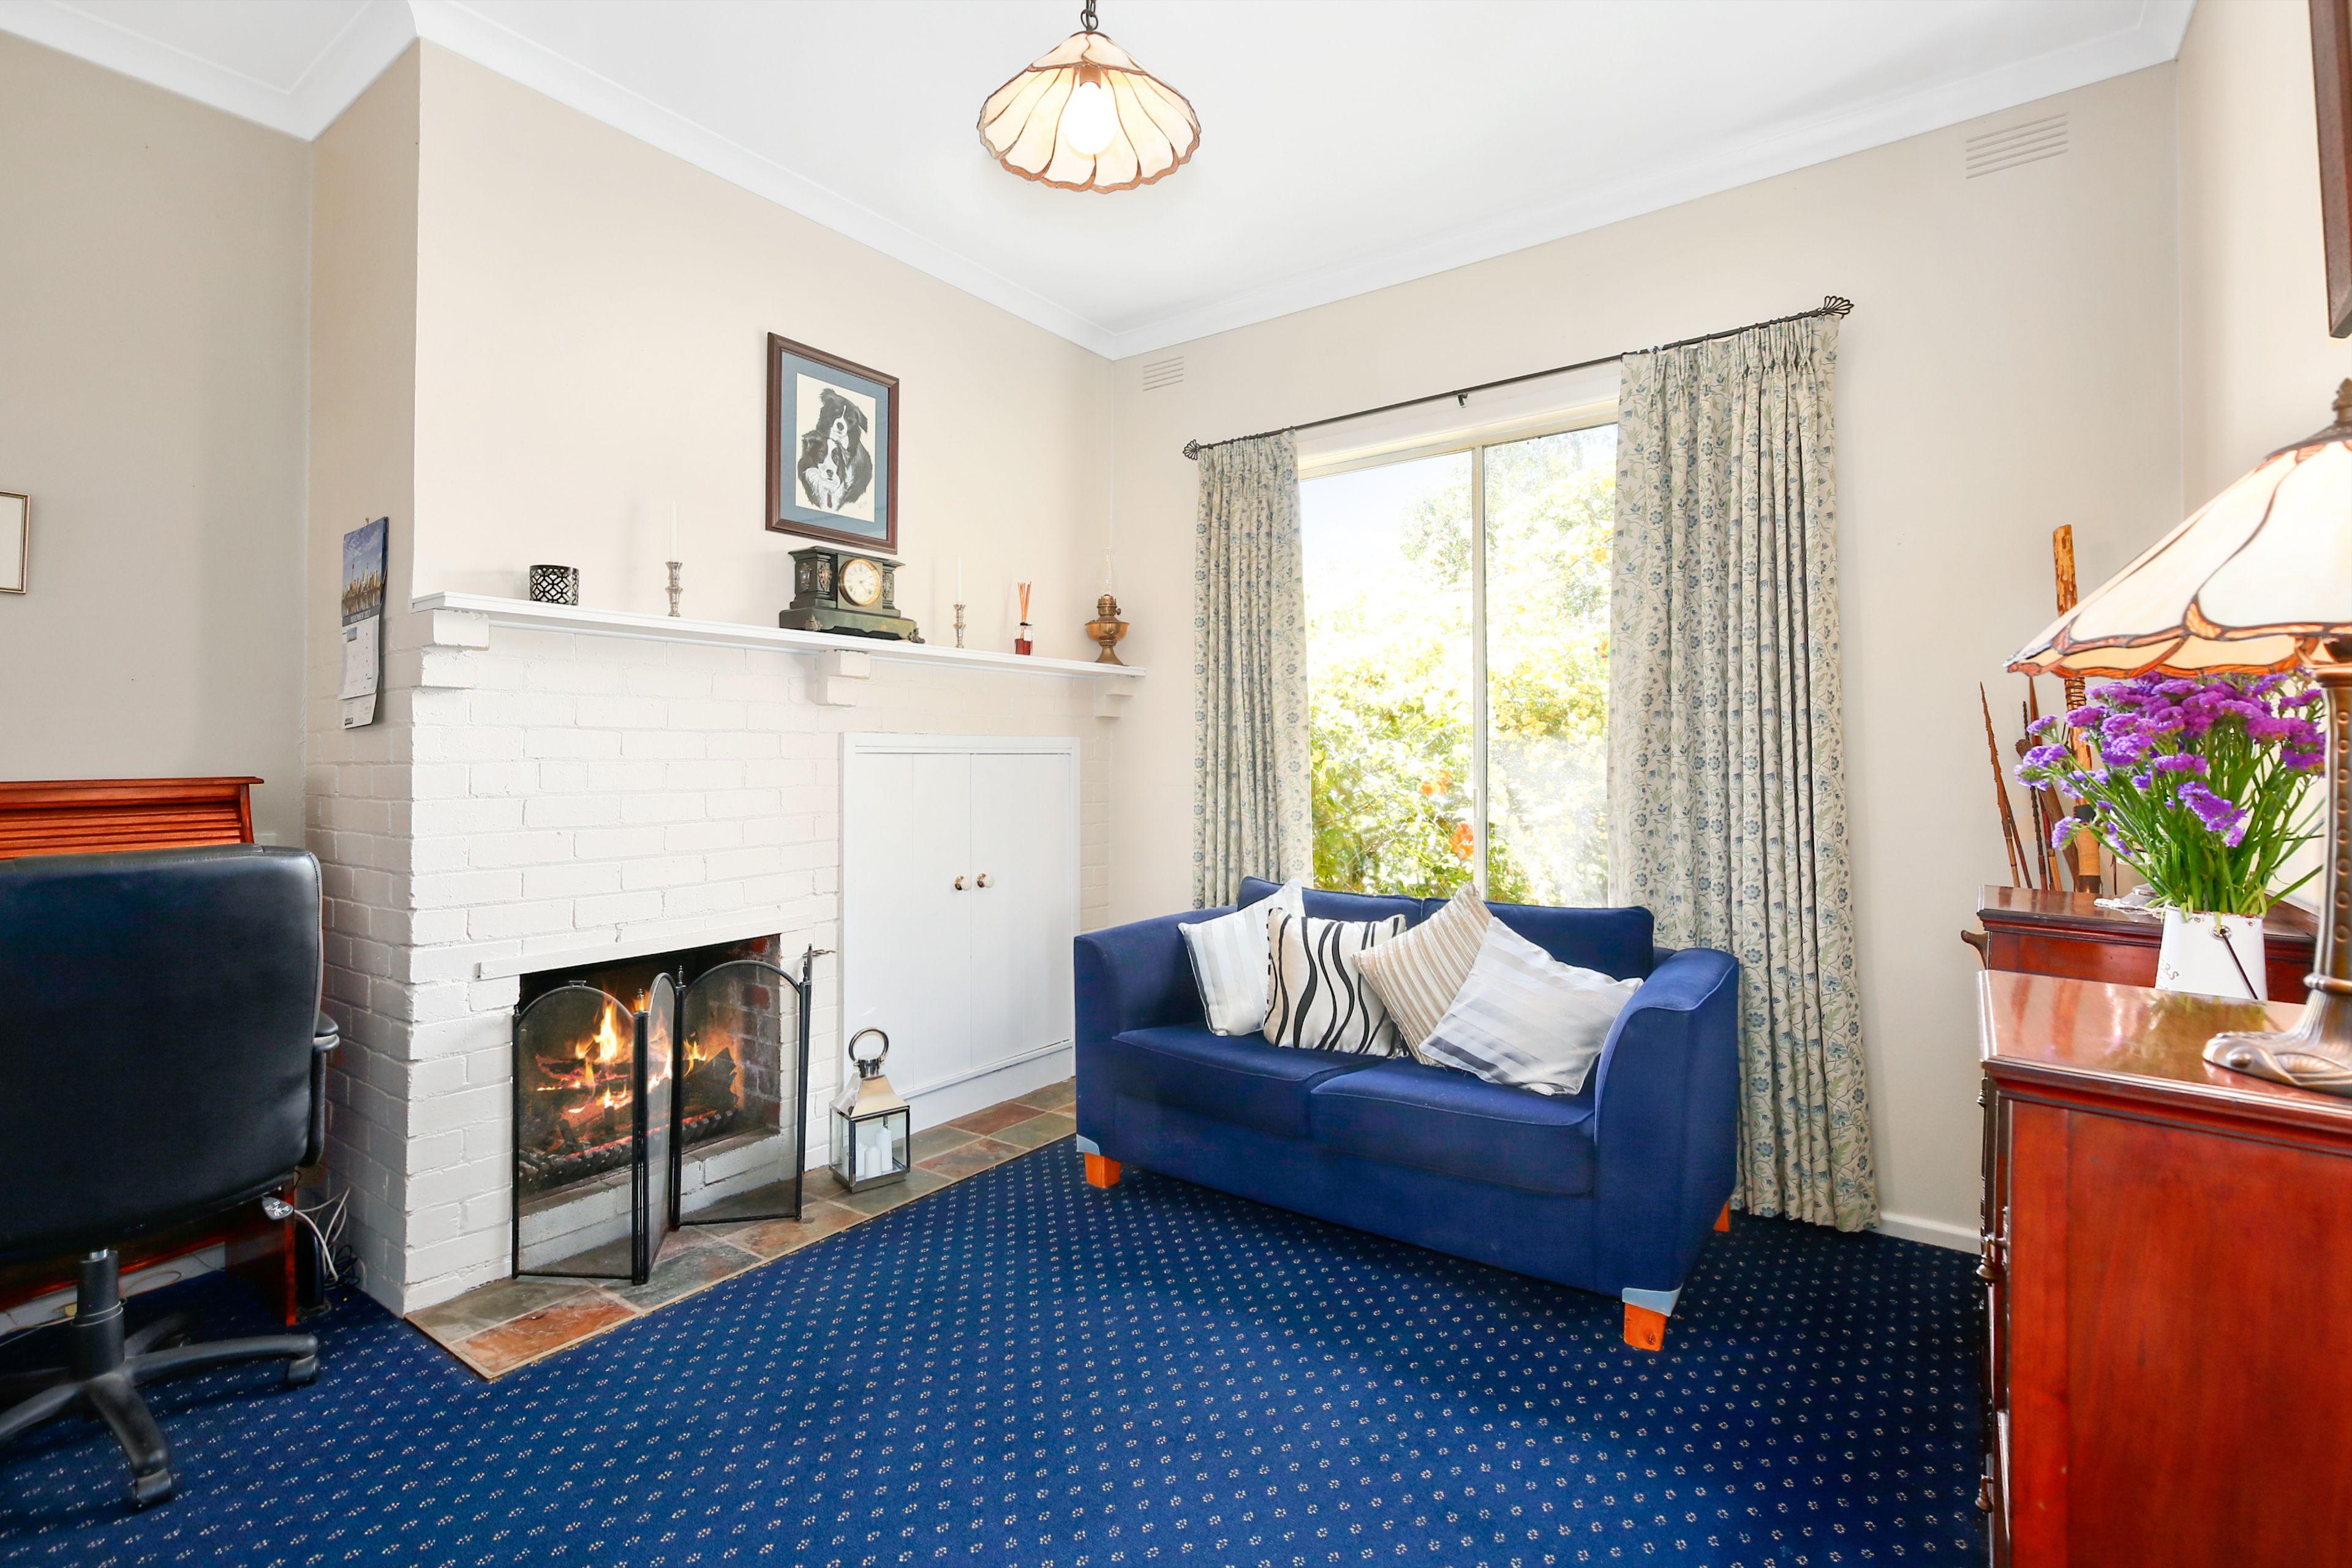 3830 Whittlesea - Yea Road Flowerdale